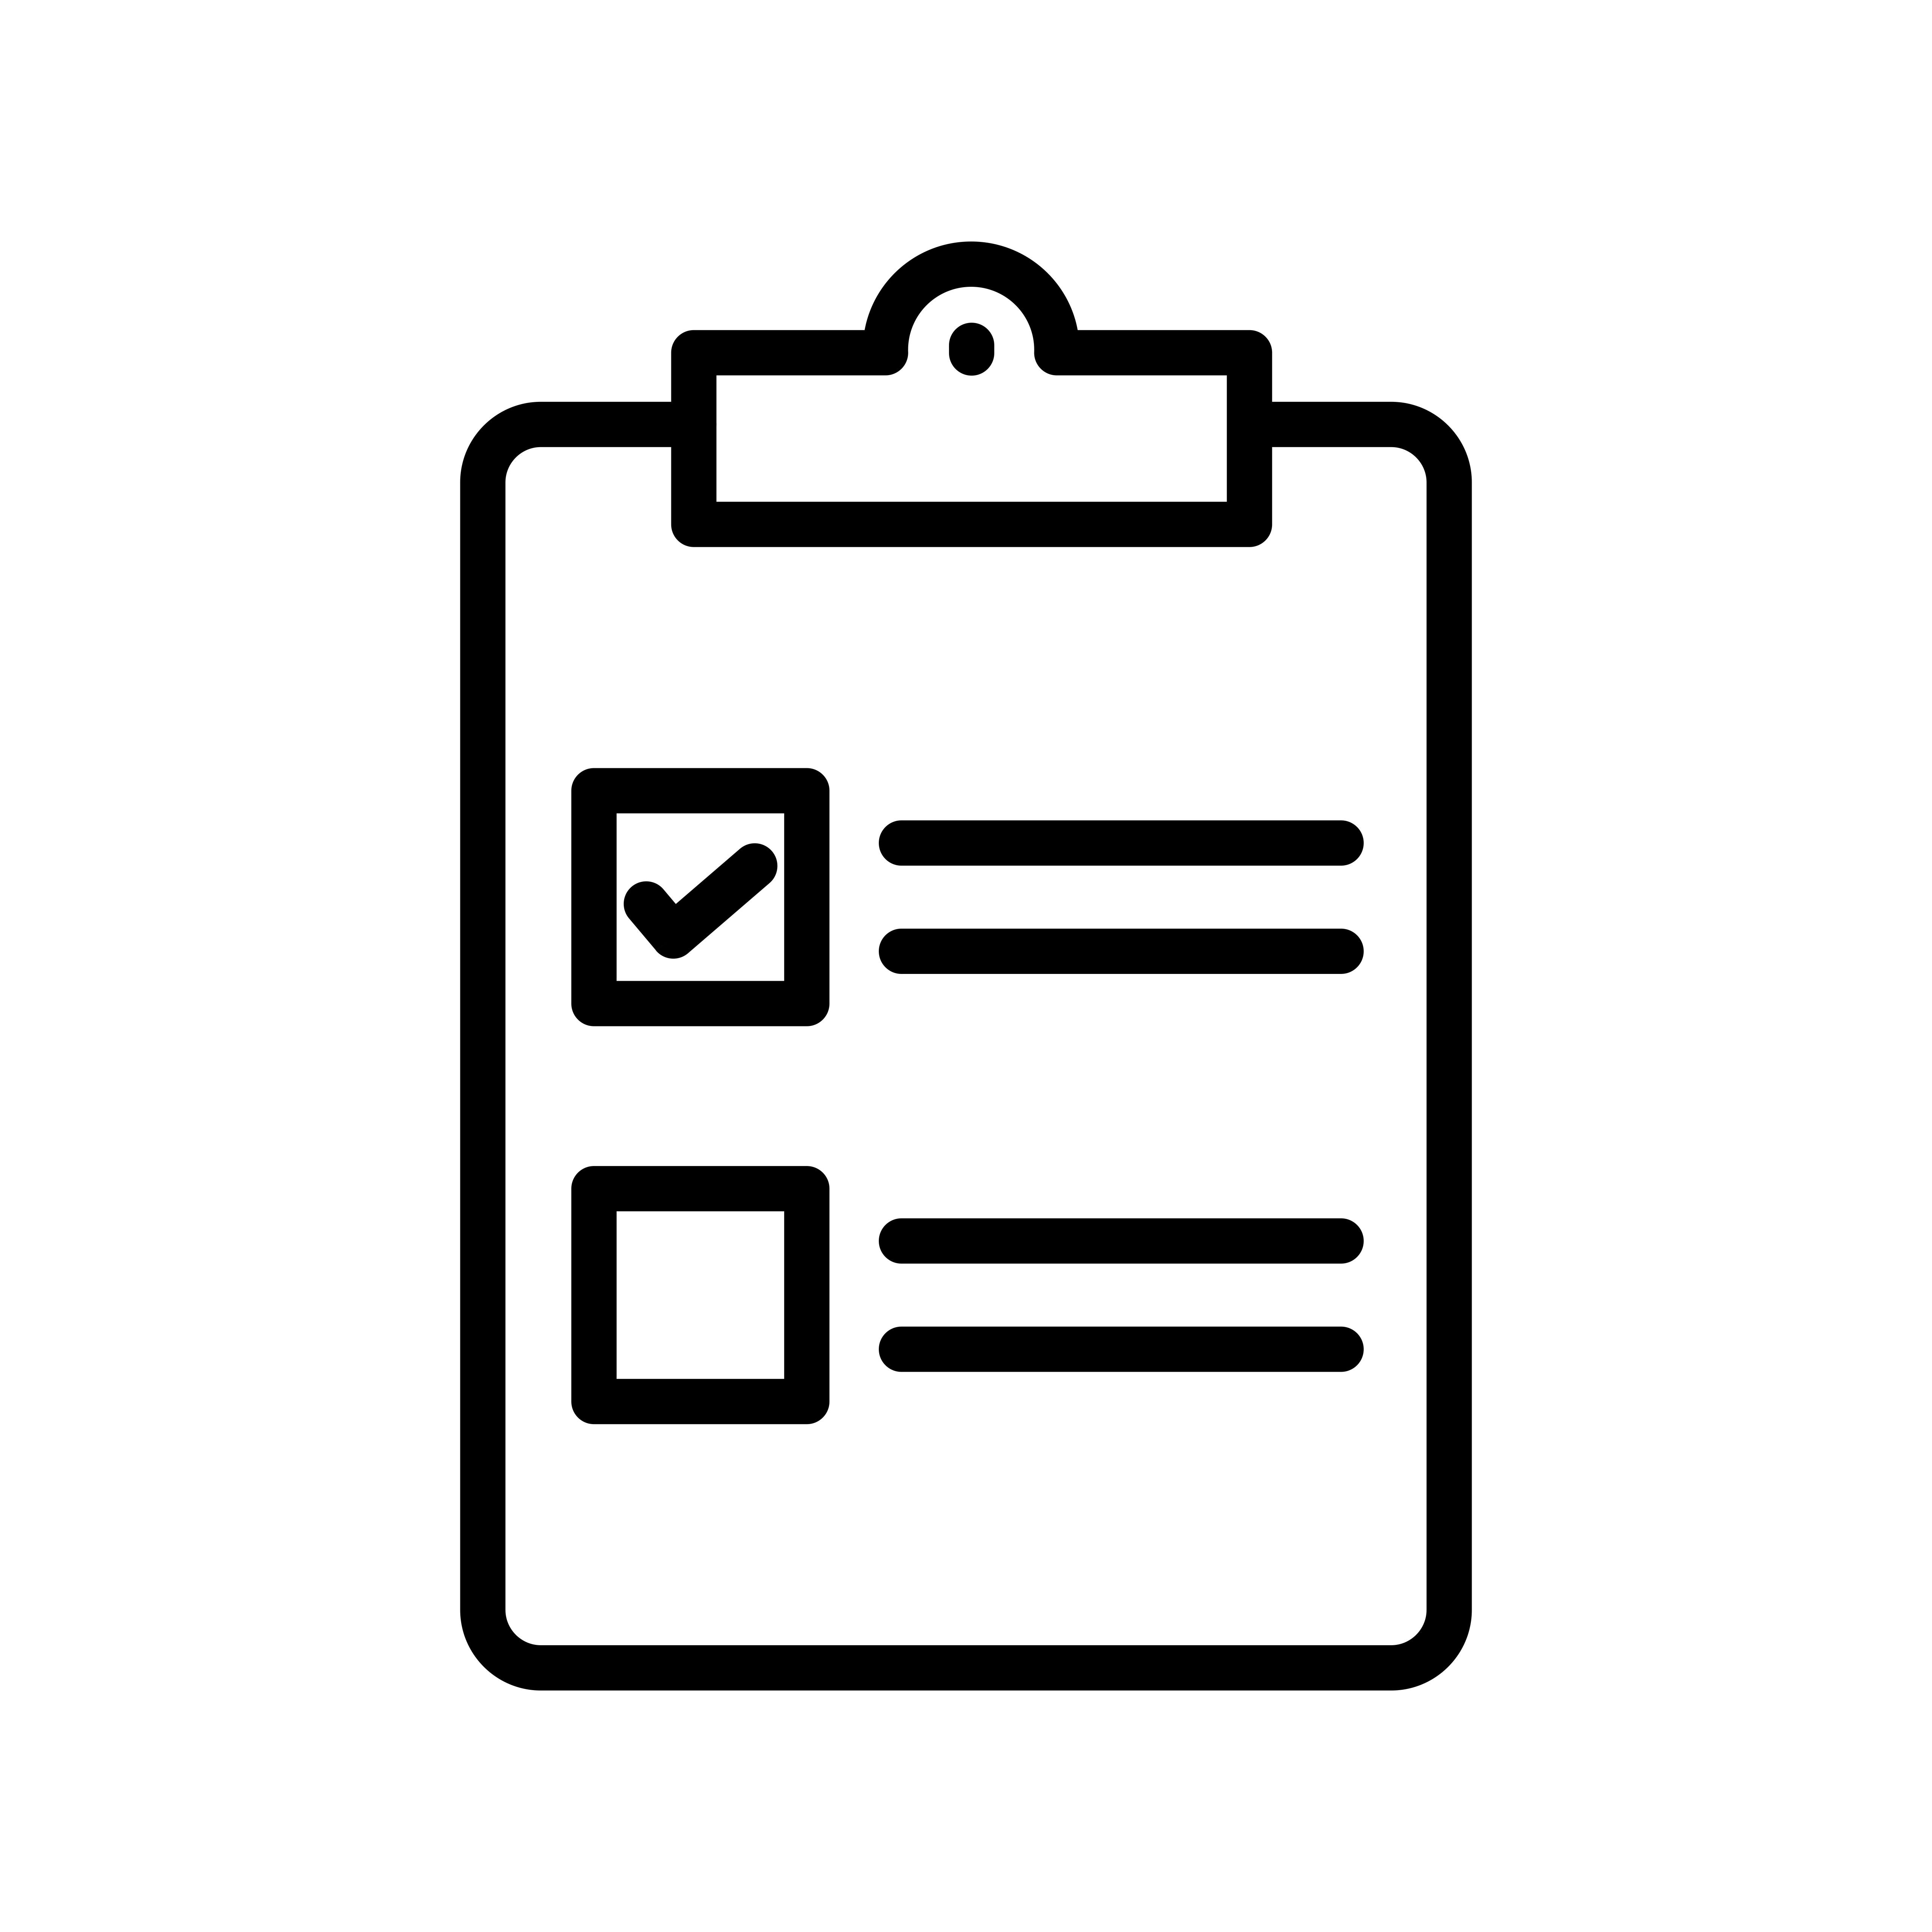 Checklist Icon Free Vector Art